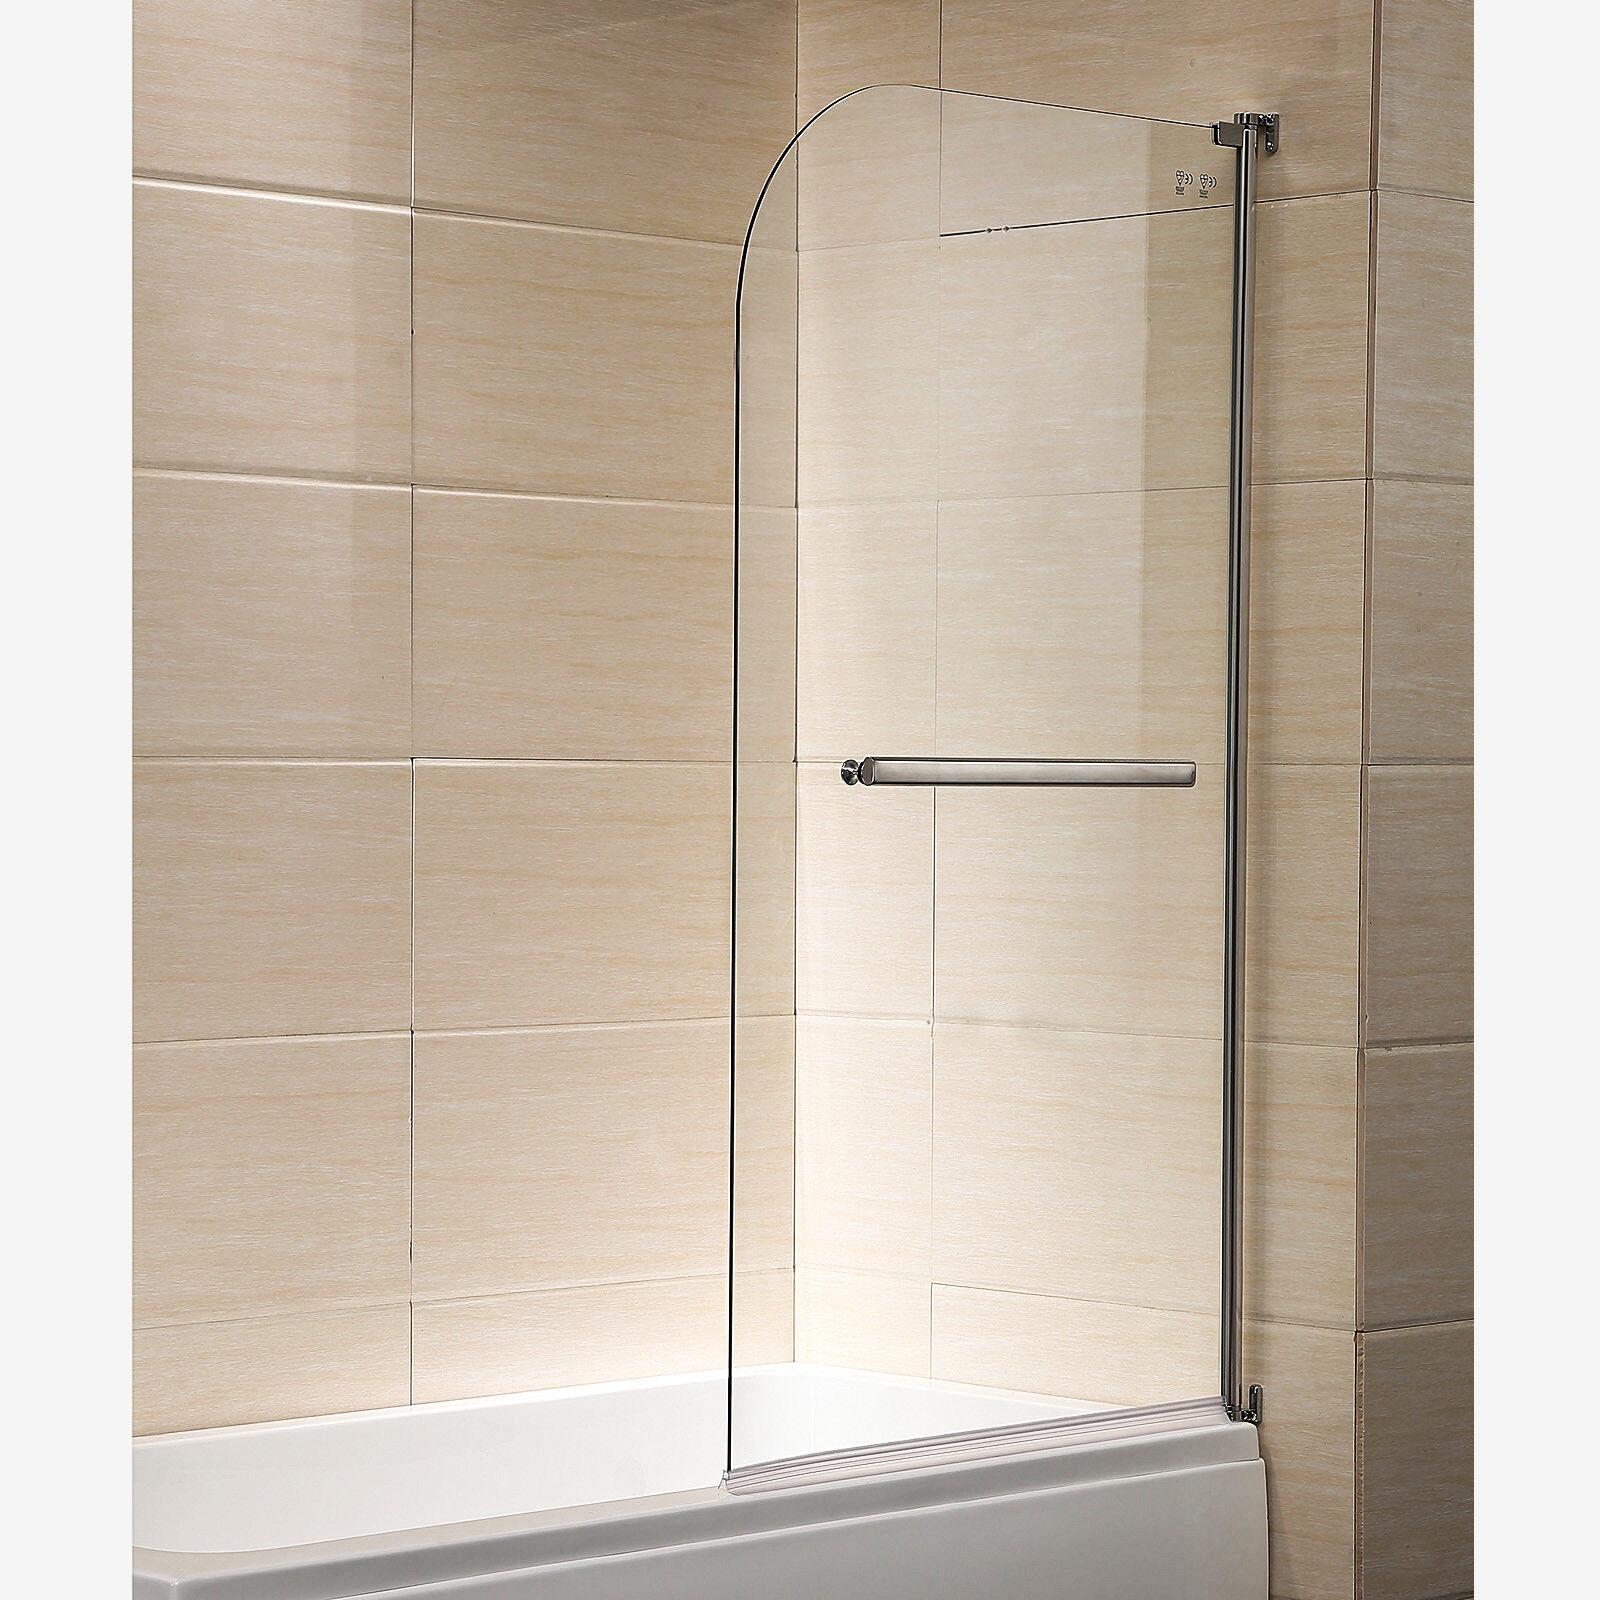 Details About Modern 55 X31 1 4 Bath Shower Door Hinged Frameless Clear Glass Chrome